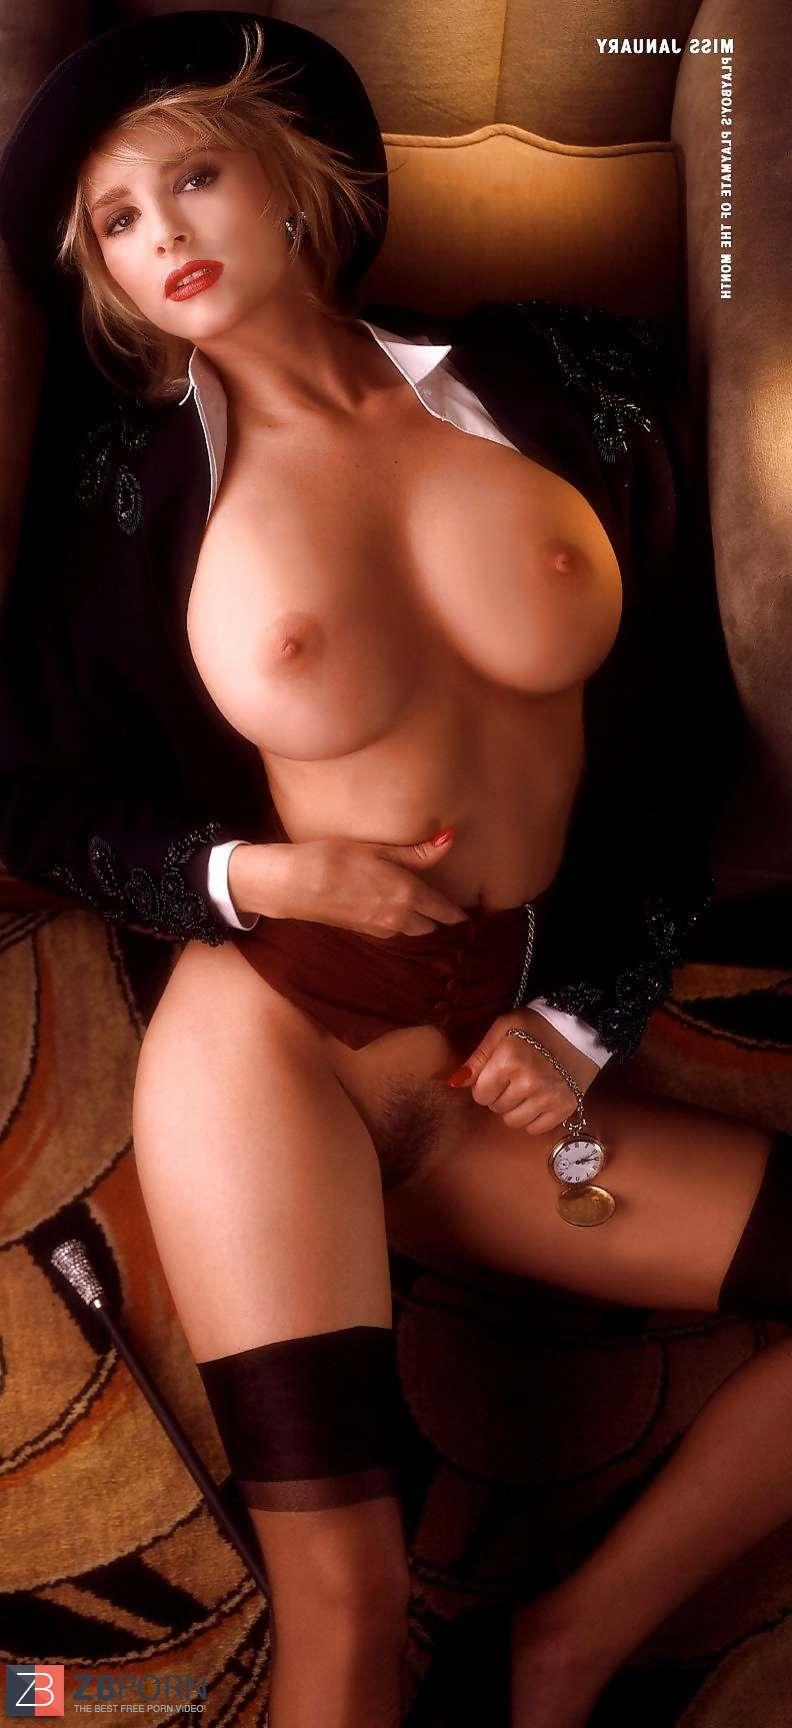 Videos Playboy